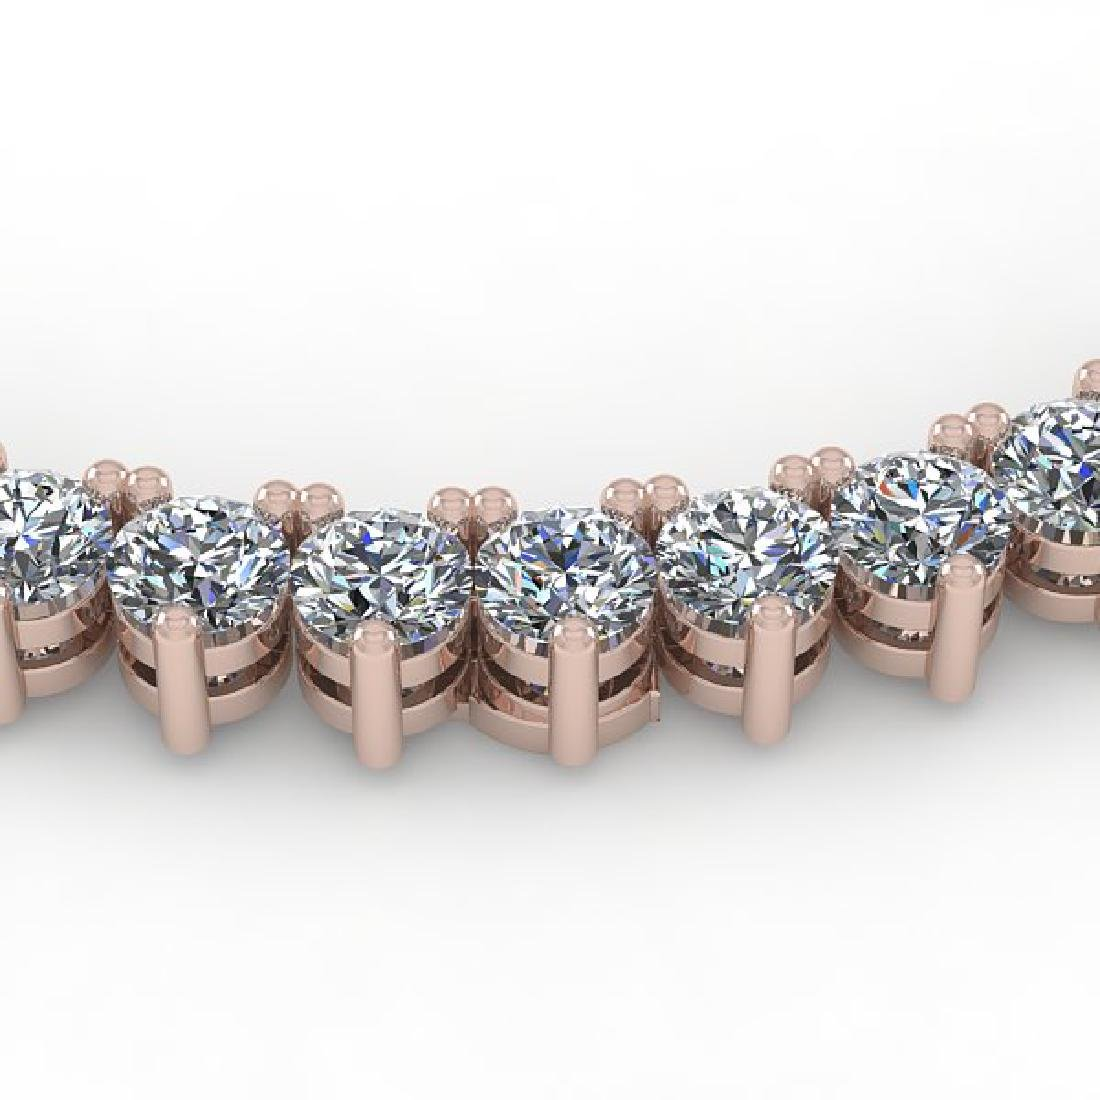 22 CTW Solitaire VS/SI Diamond Necklace 14K Rose Gold